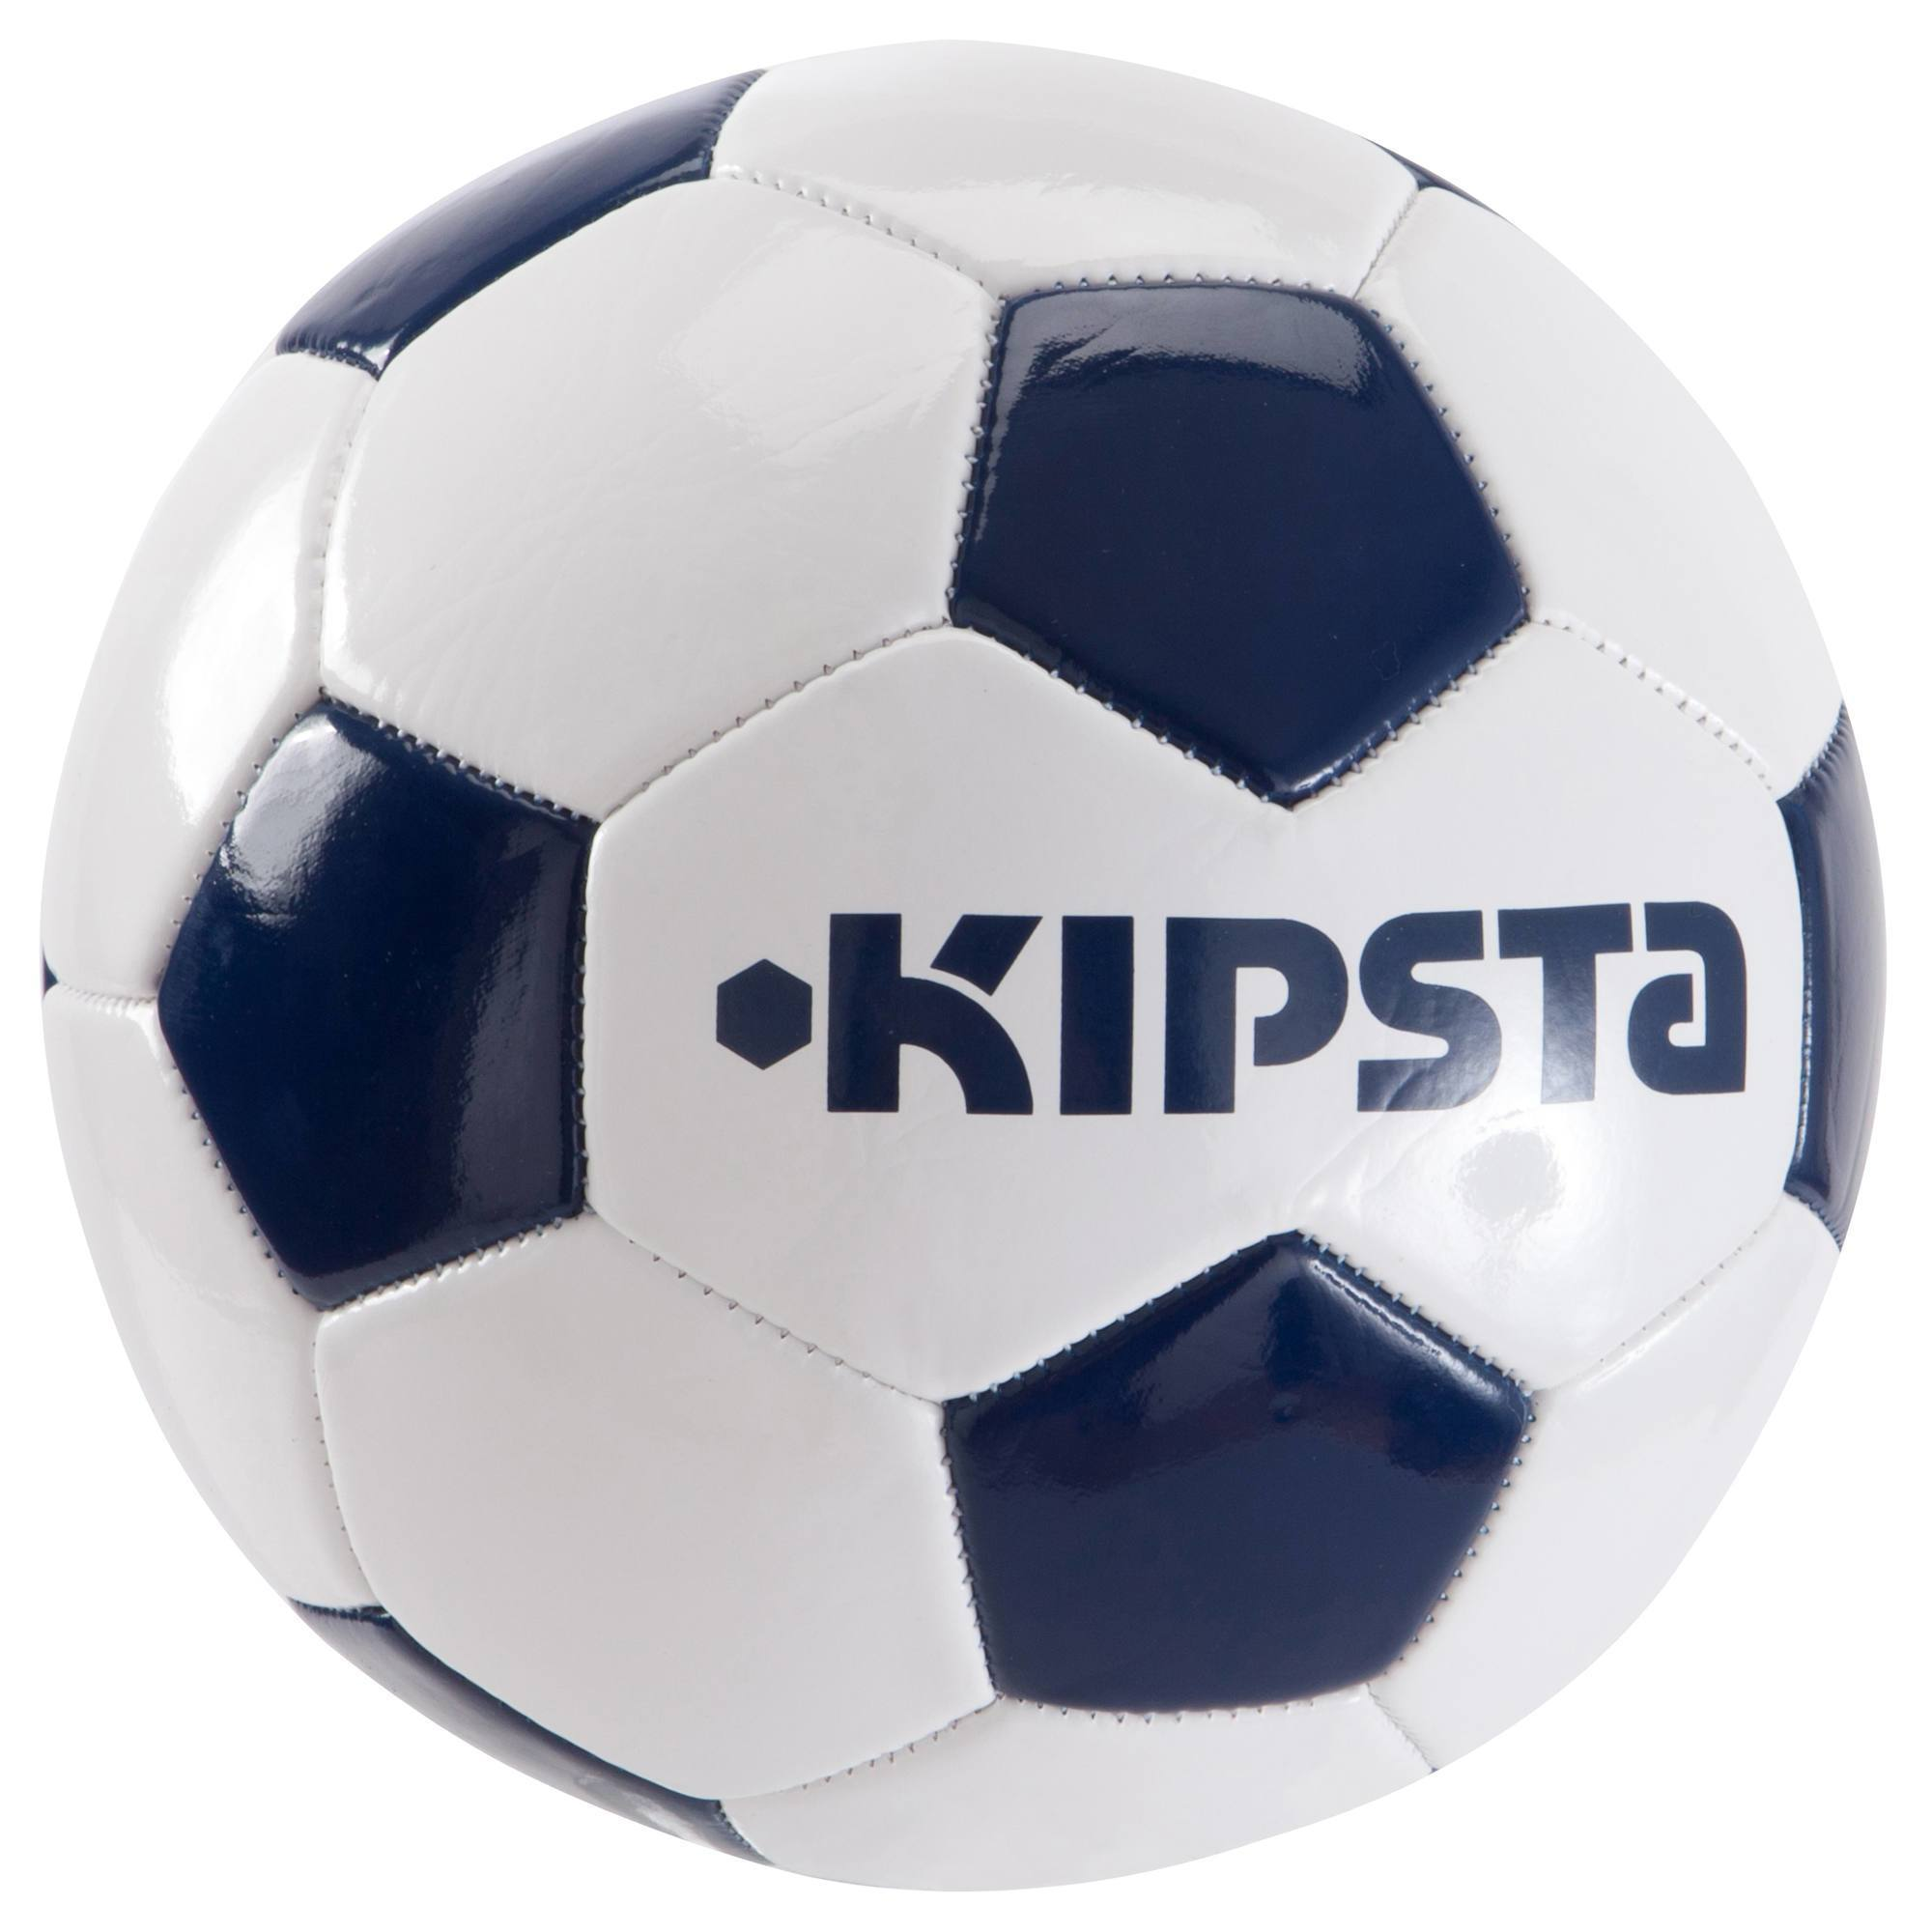 Ballon football First Kick taille 3 blanc bleu